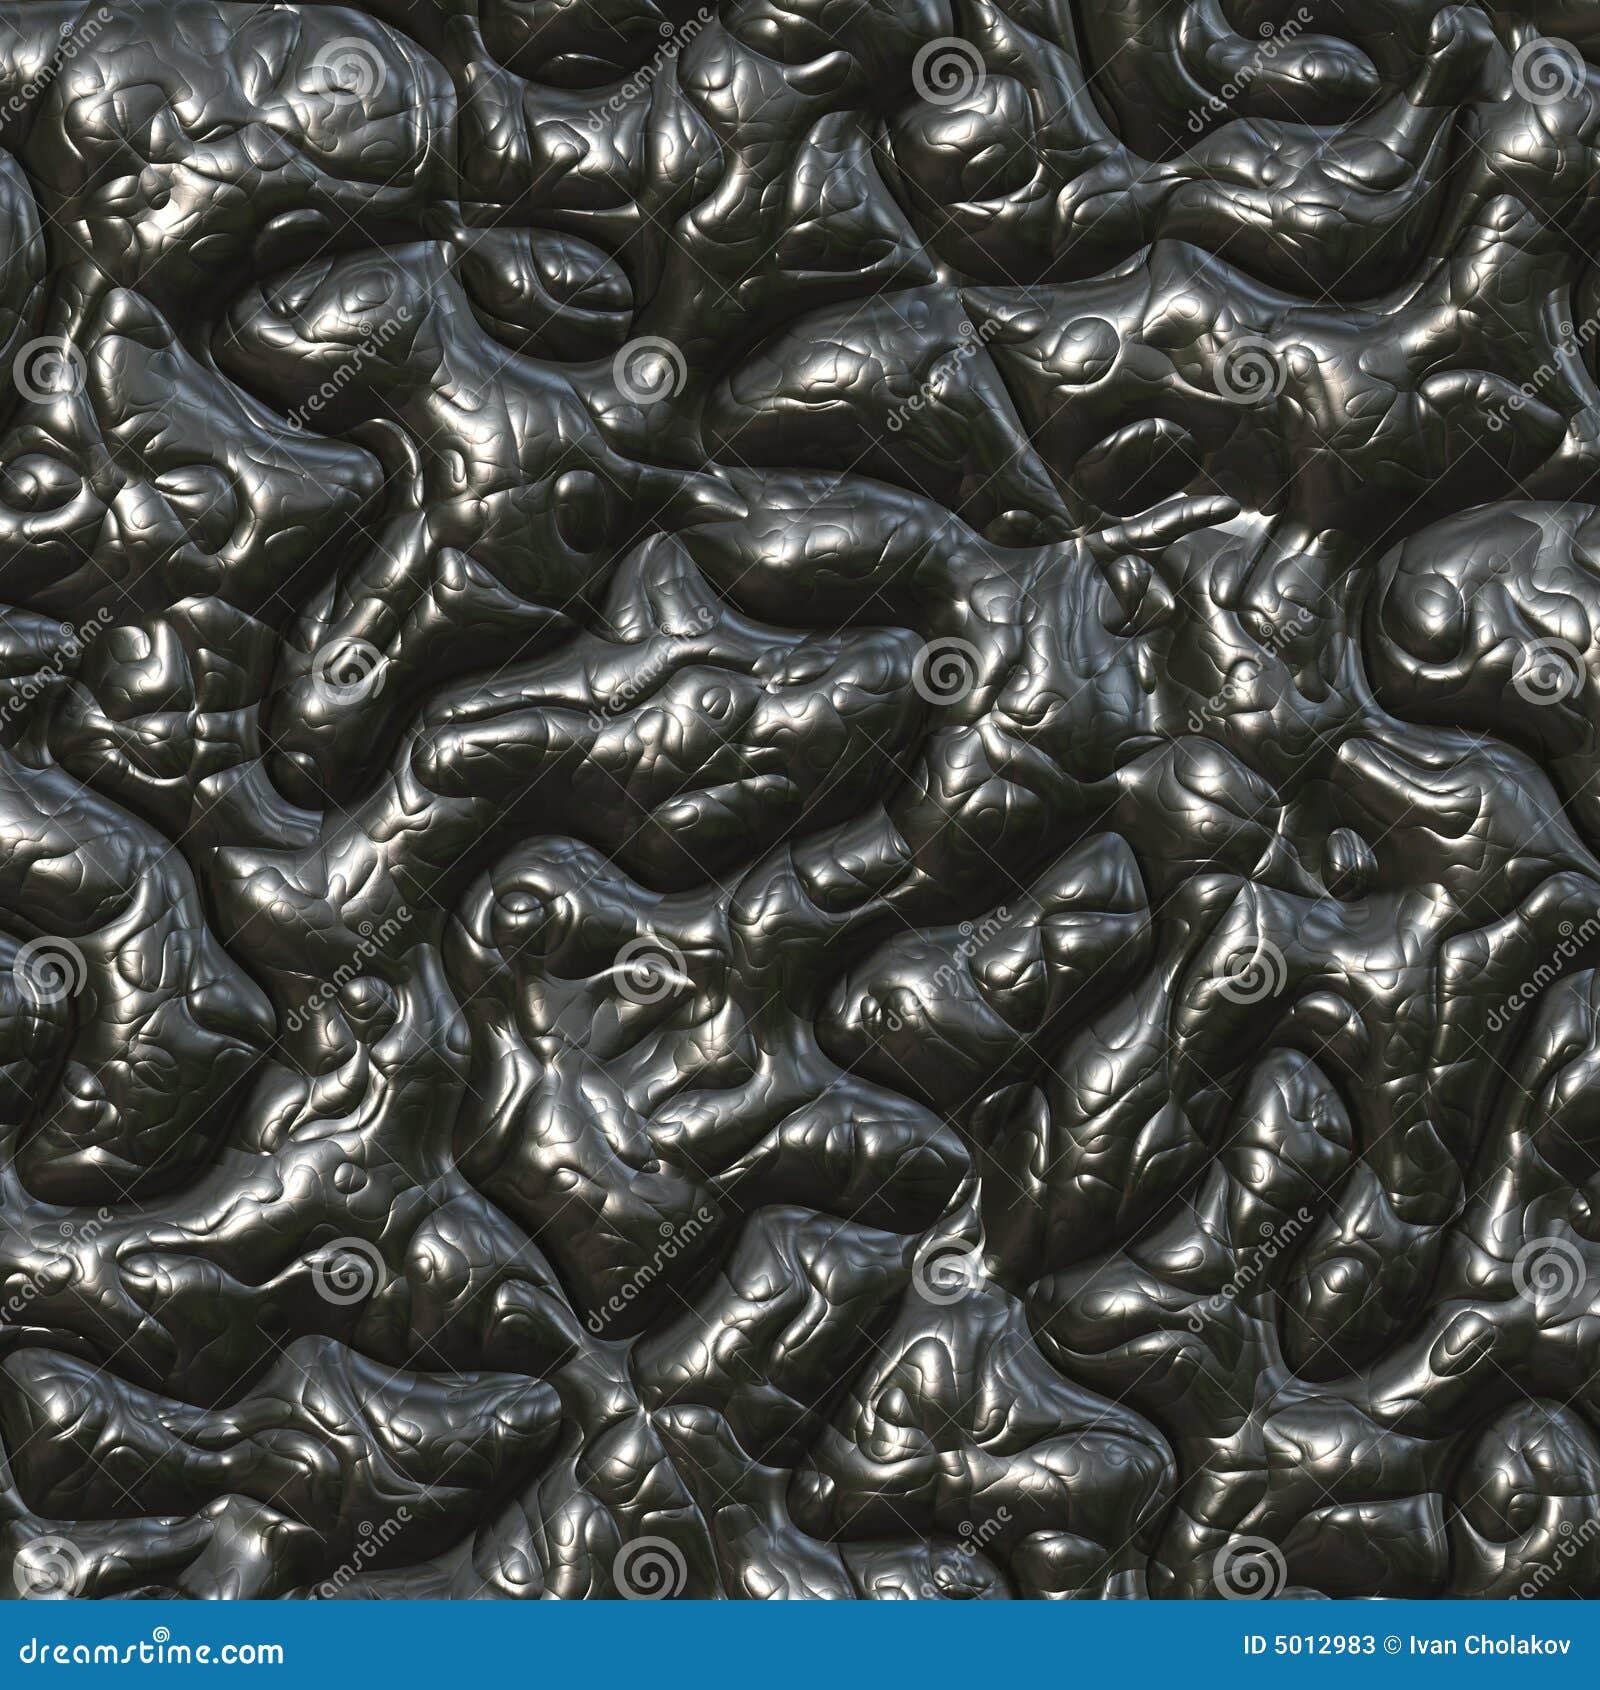 Melted black tar for b...